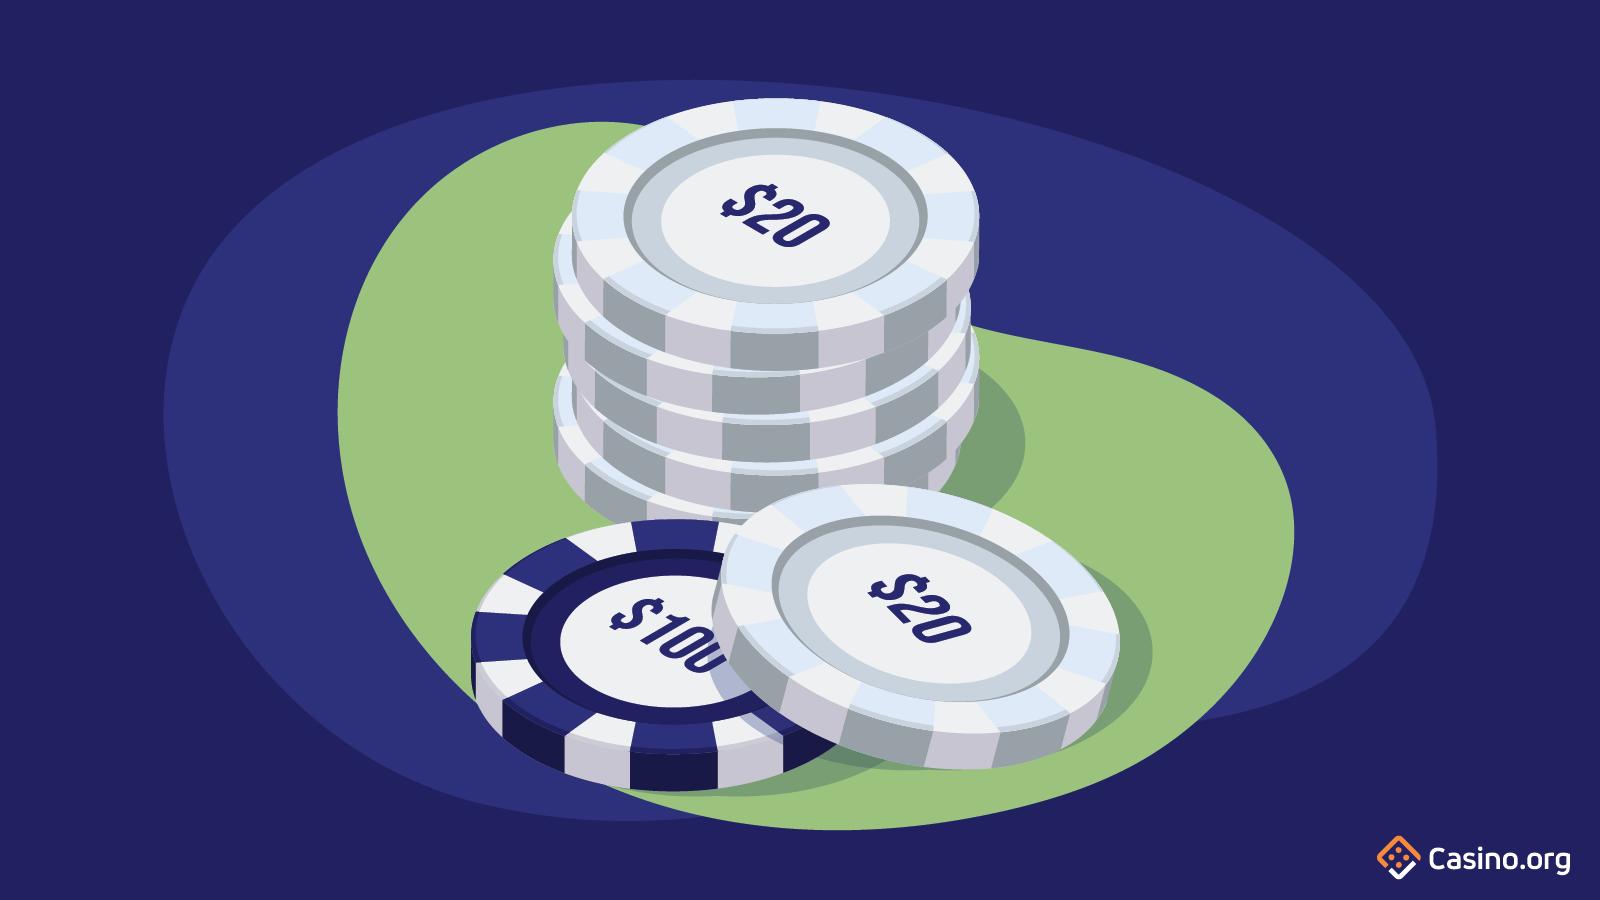 Hiding big chips in poker